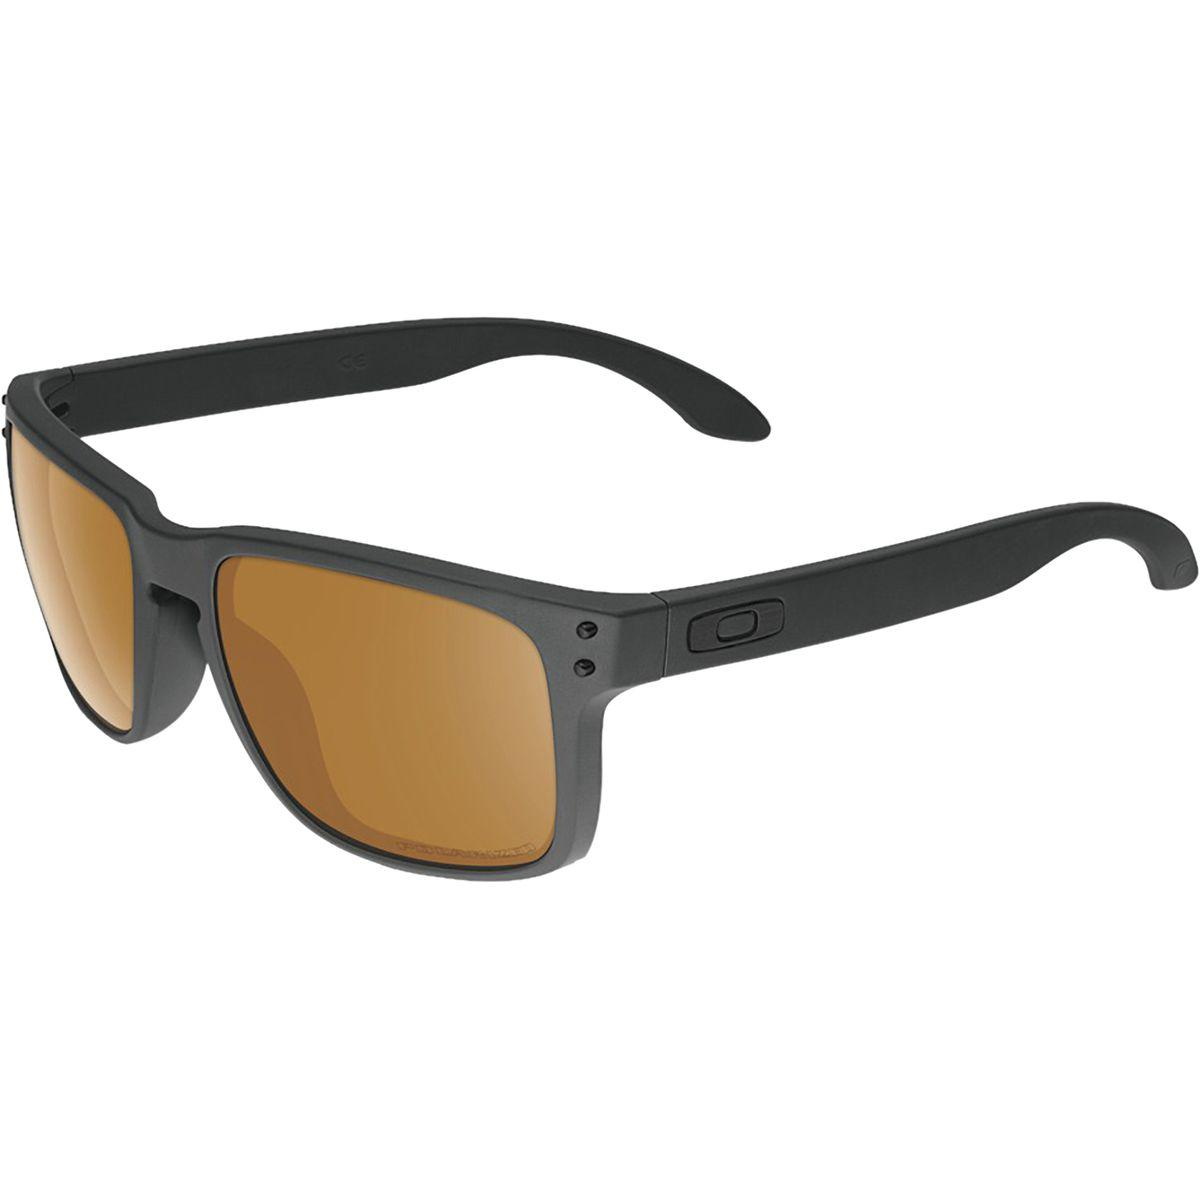 4e4f05f48a27c Lyst - Oakley Holbrook Polarized Sunglasses in Black for Men